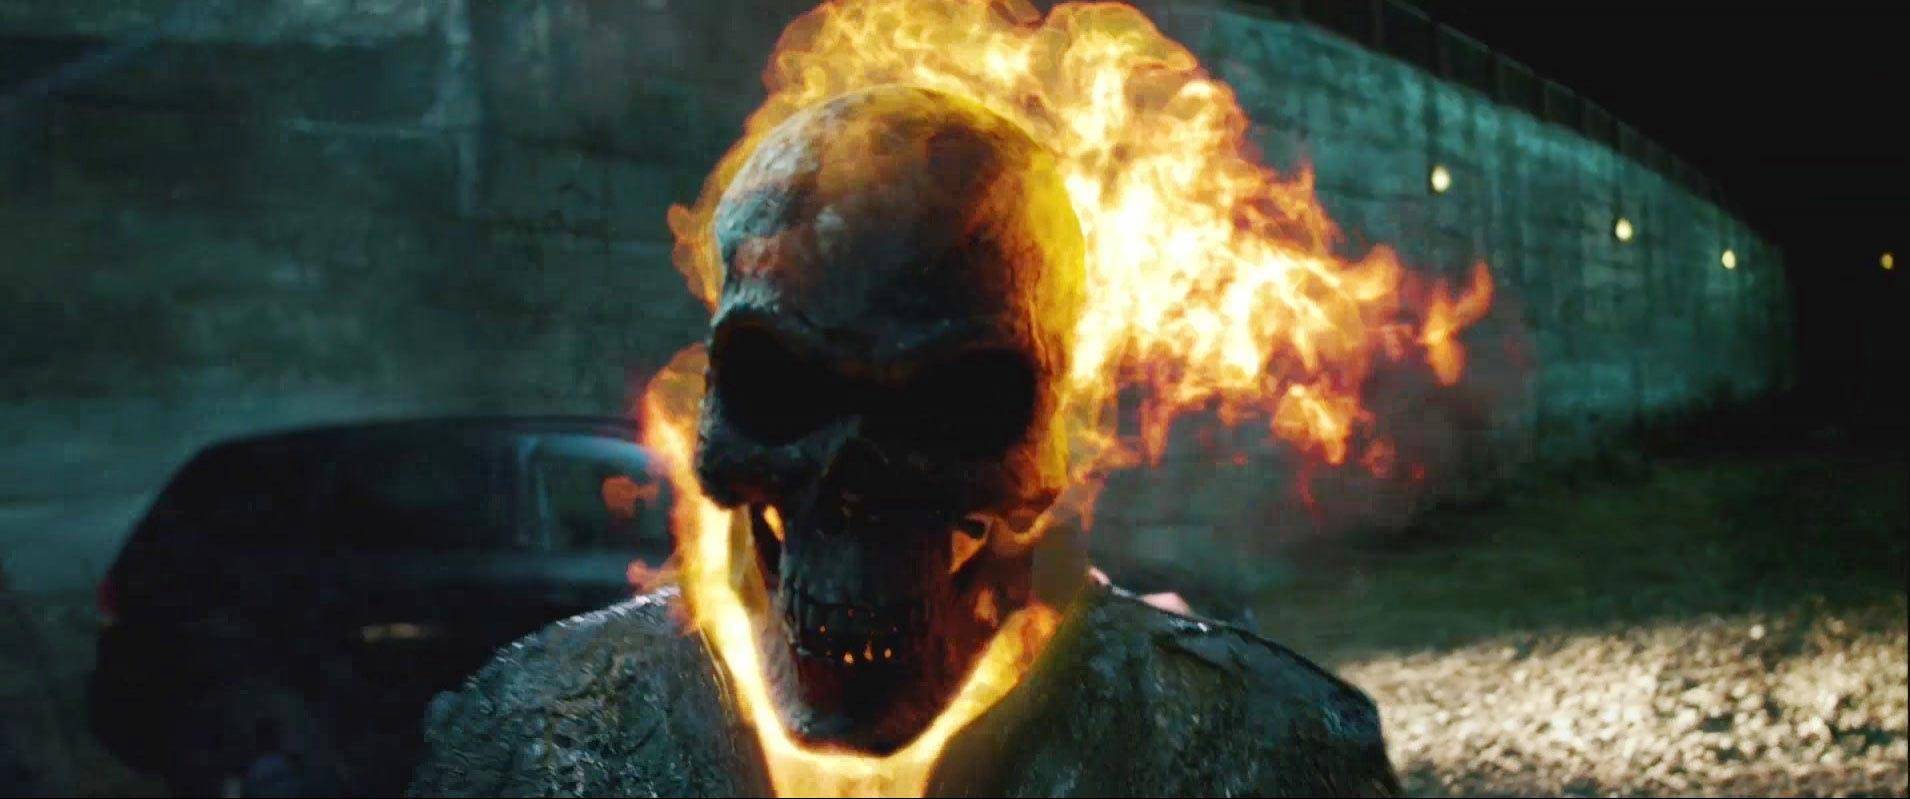 Ghost Rider Spirit Of Vengeance Wallpaper HD Download